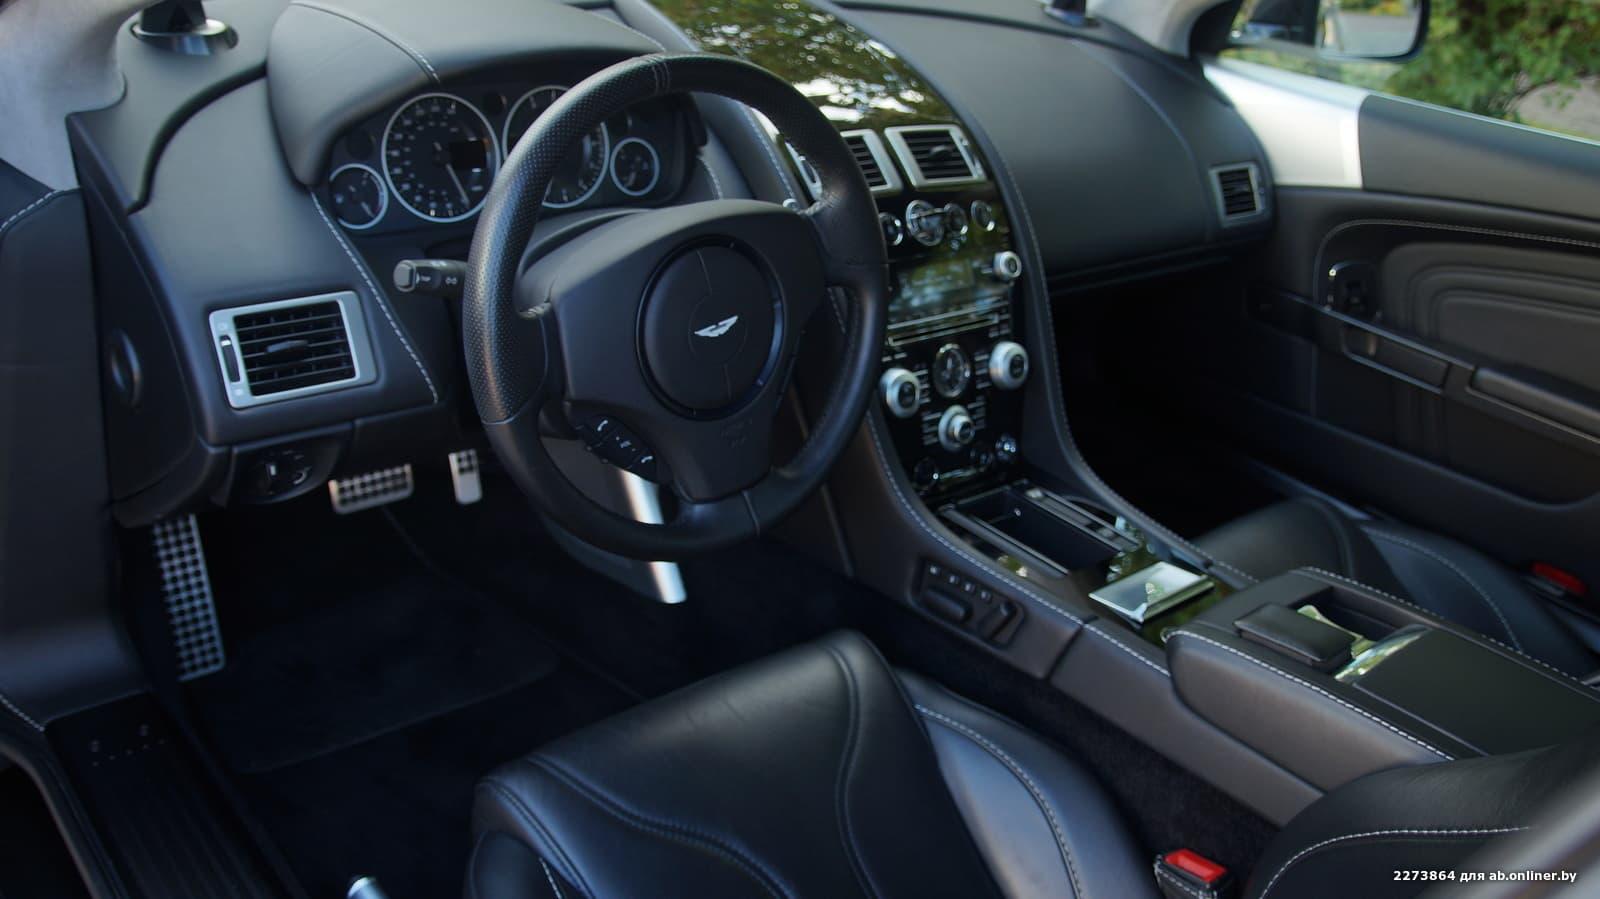 Aston Martin V12 Vantage DBS II CARBON EDITION